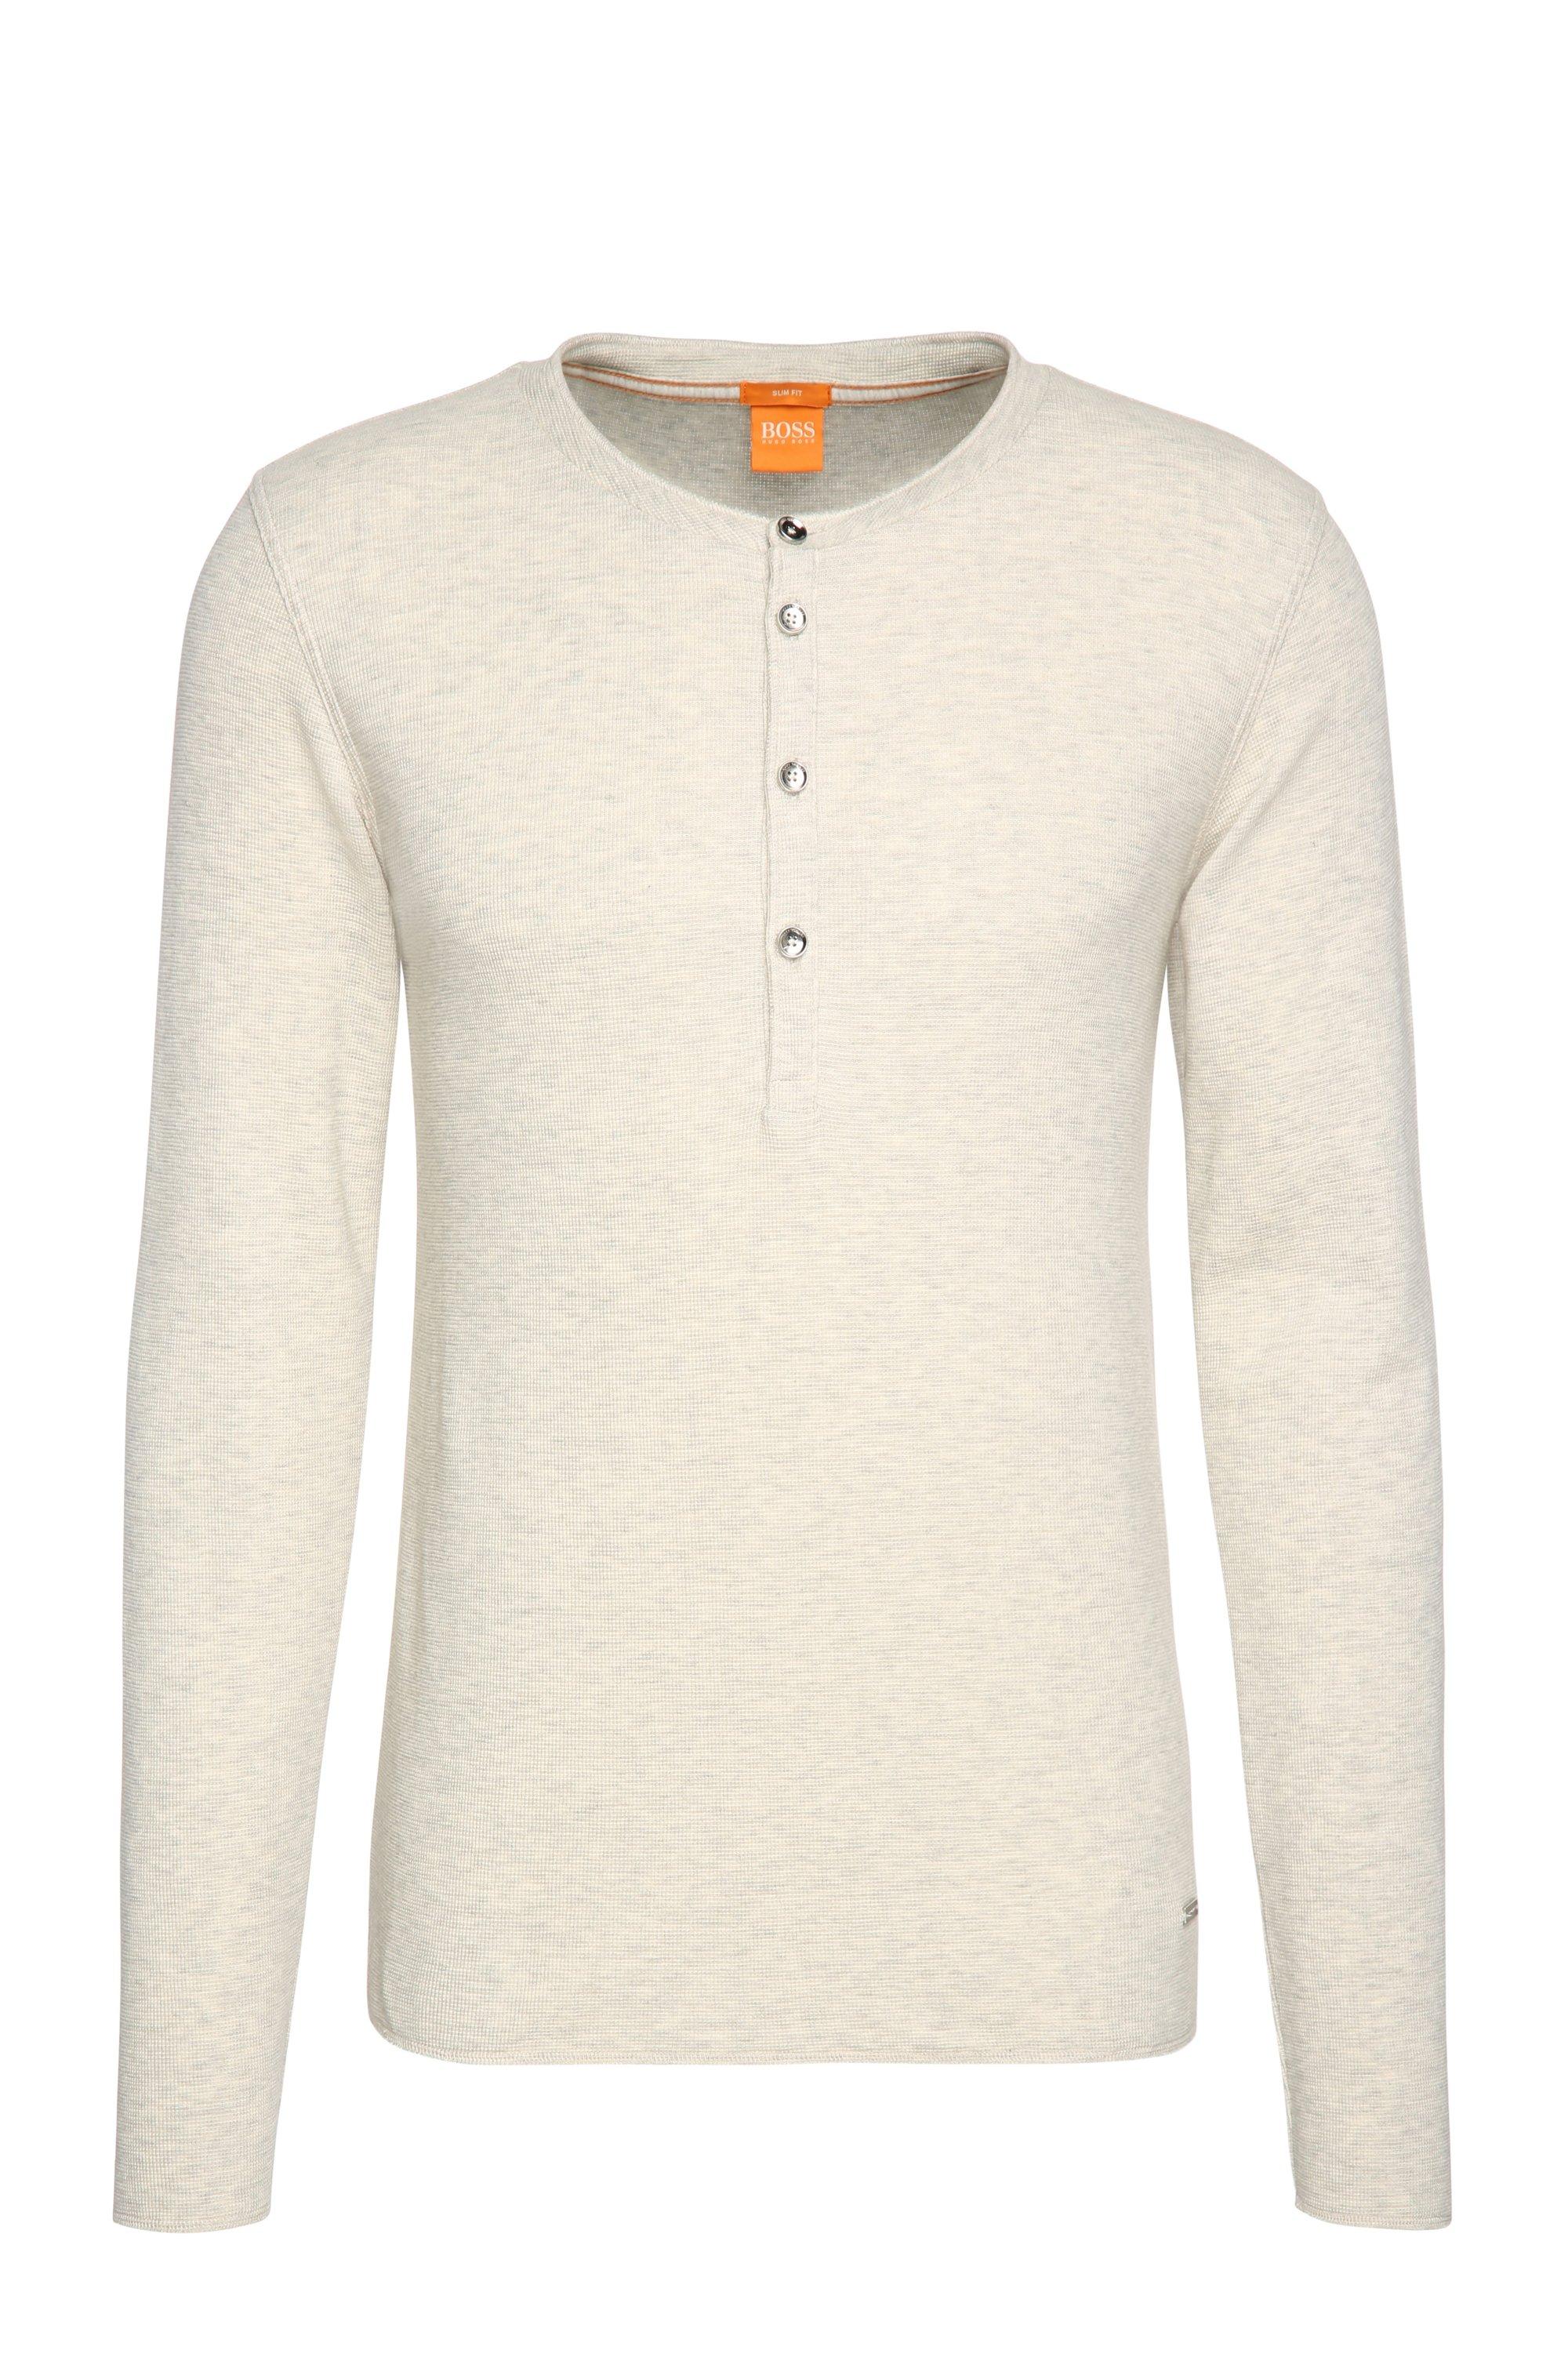 Cotton Waffle Henley Shirt   Topsider, Natural